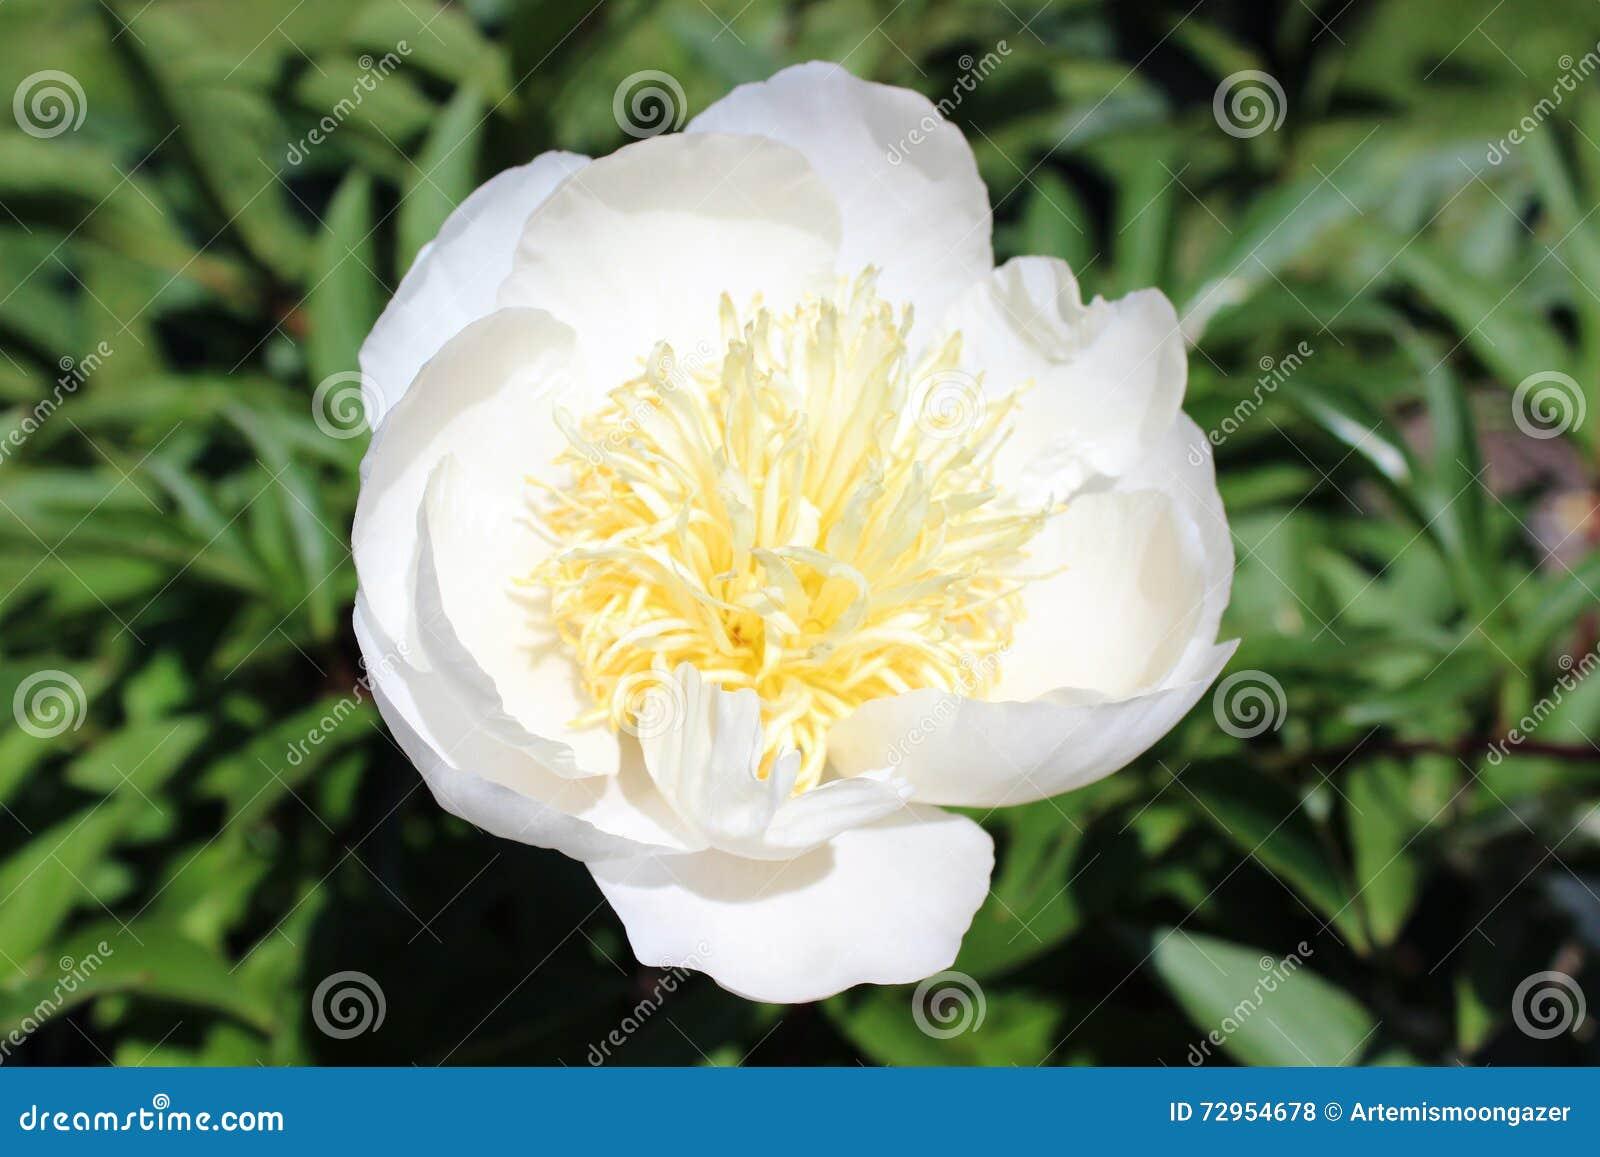 pivoine blanche simple, un macro plan rapproché photo stock - image